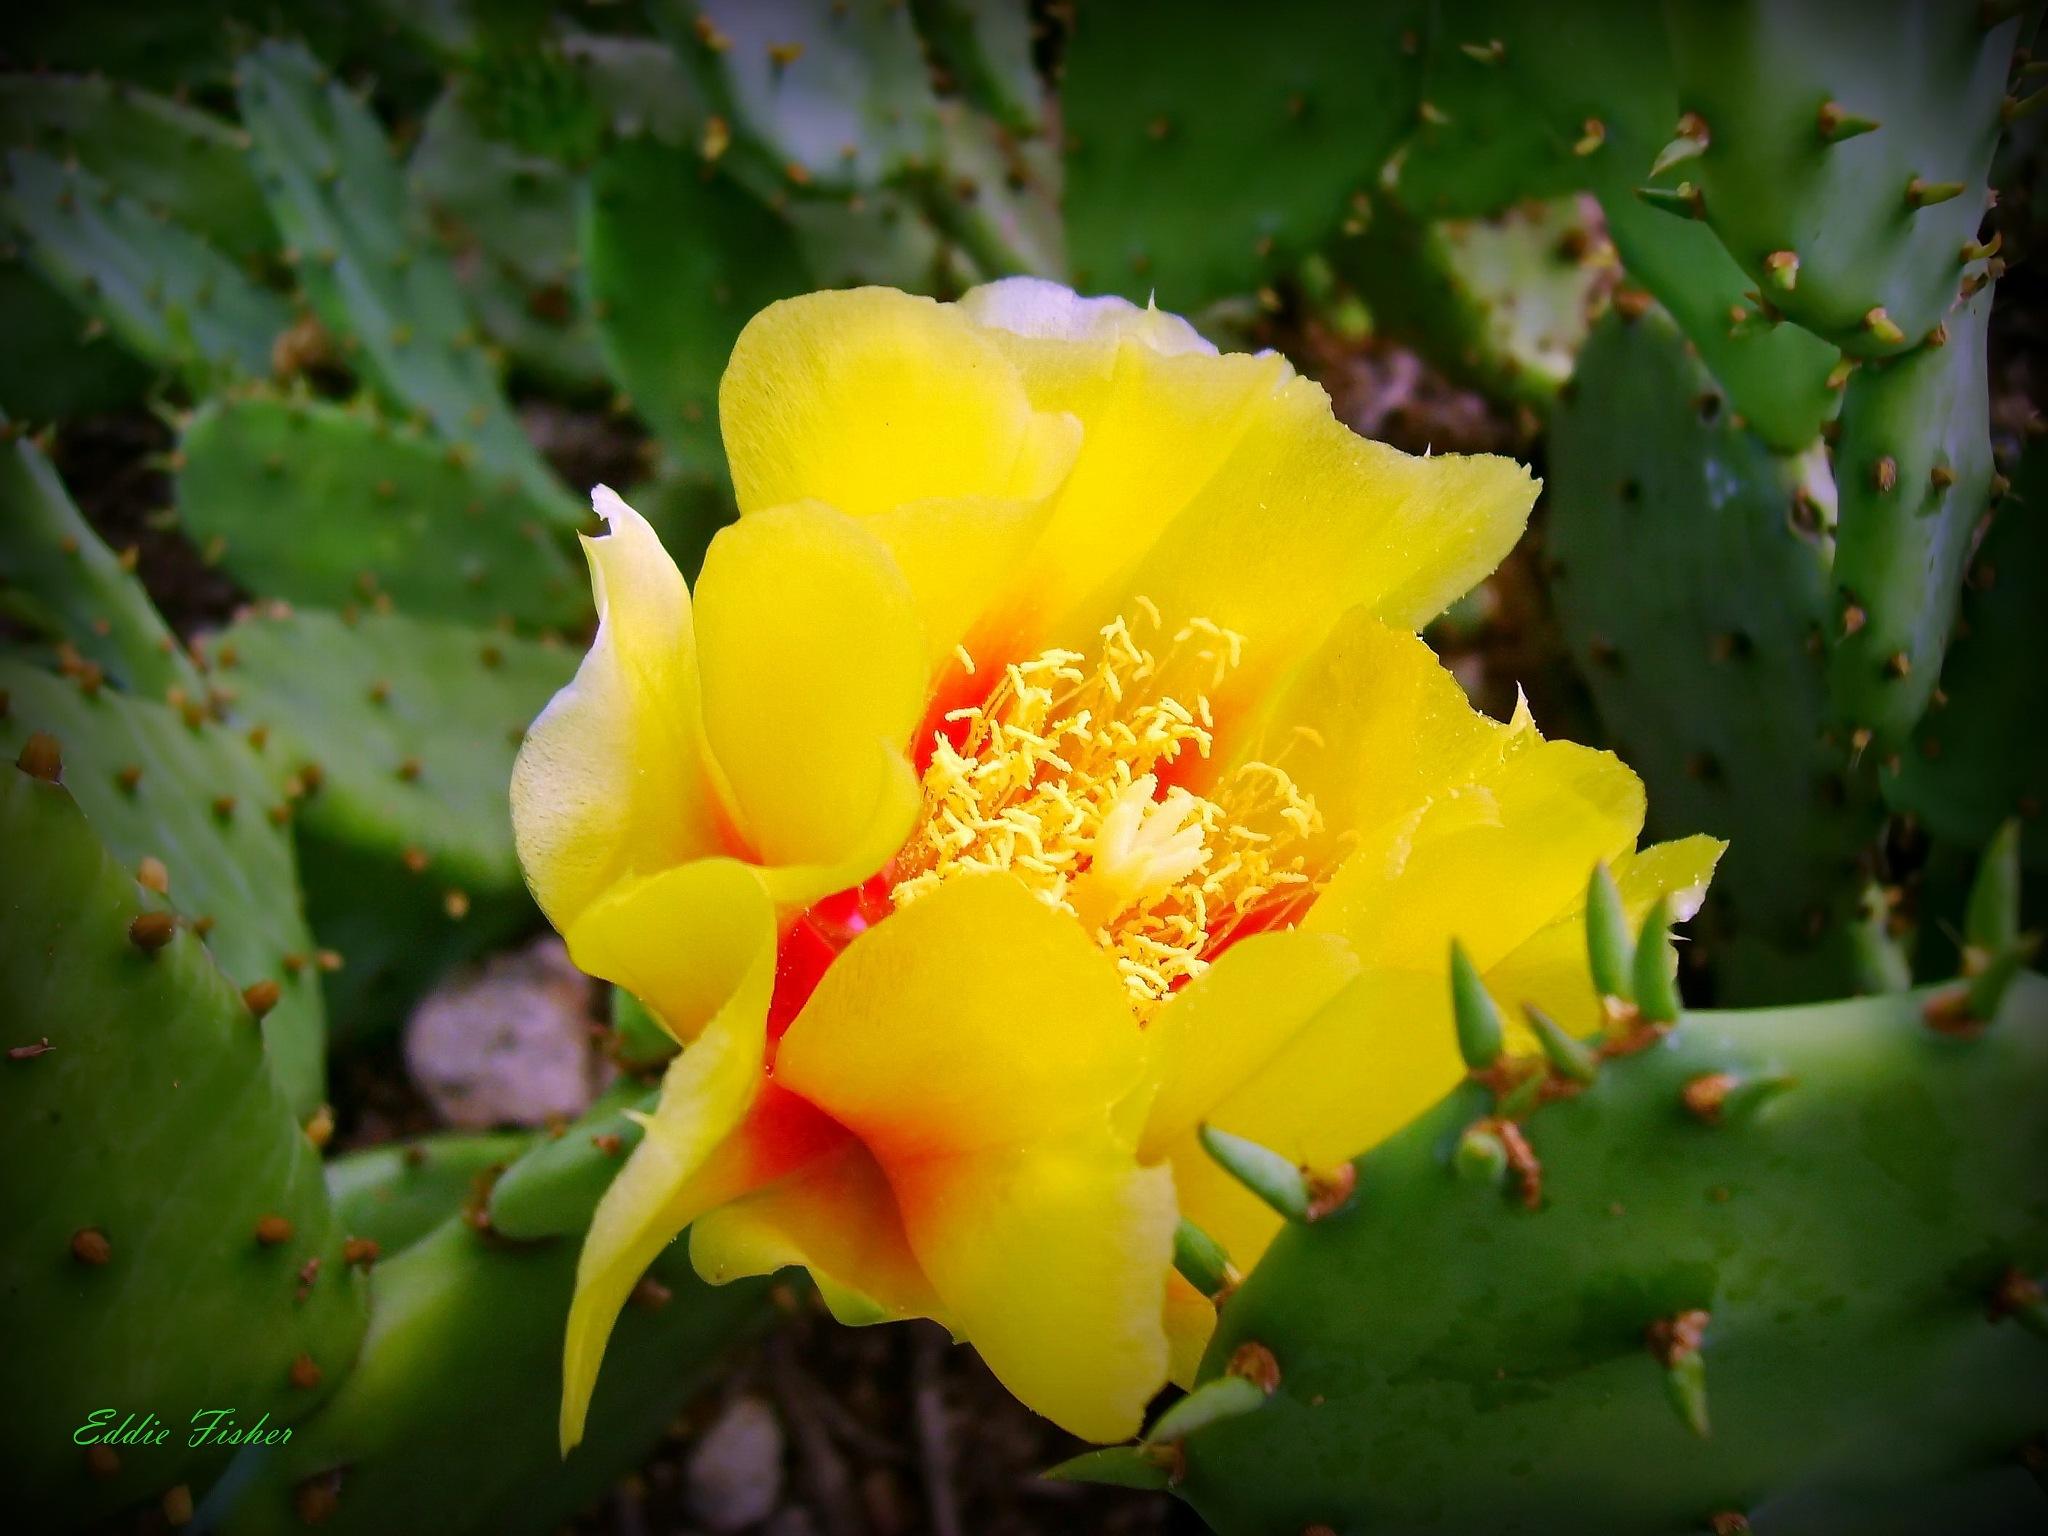 Cactus Flower by eddie.fisher.509